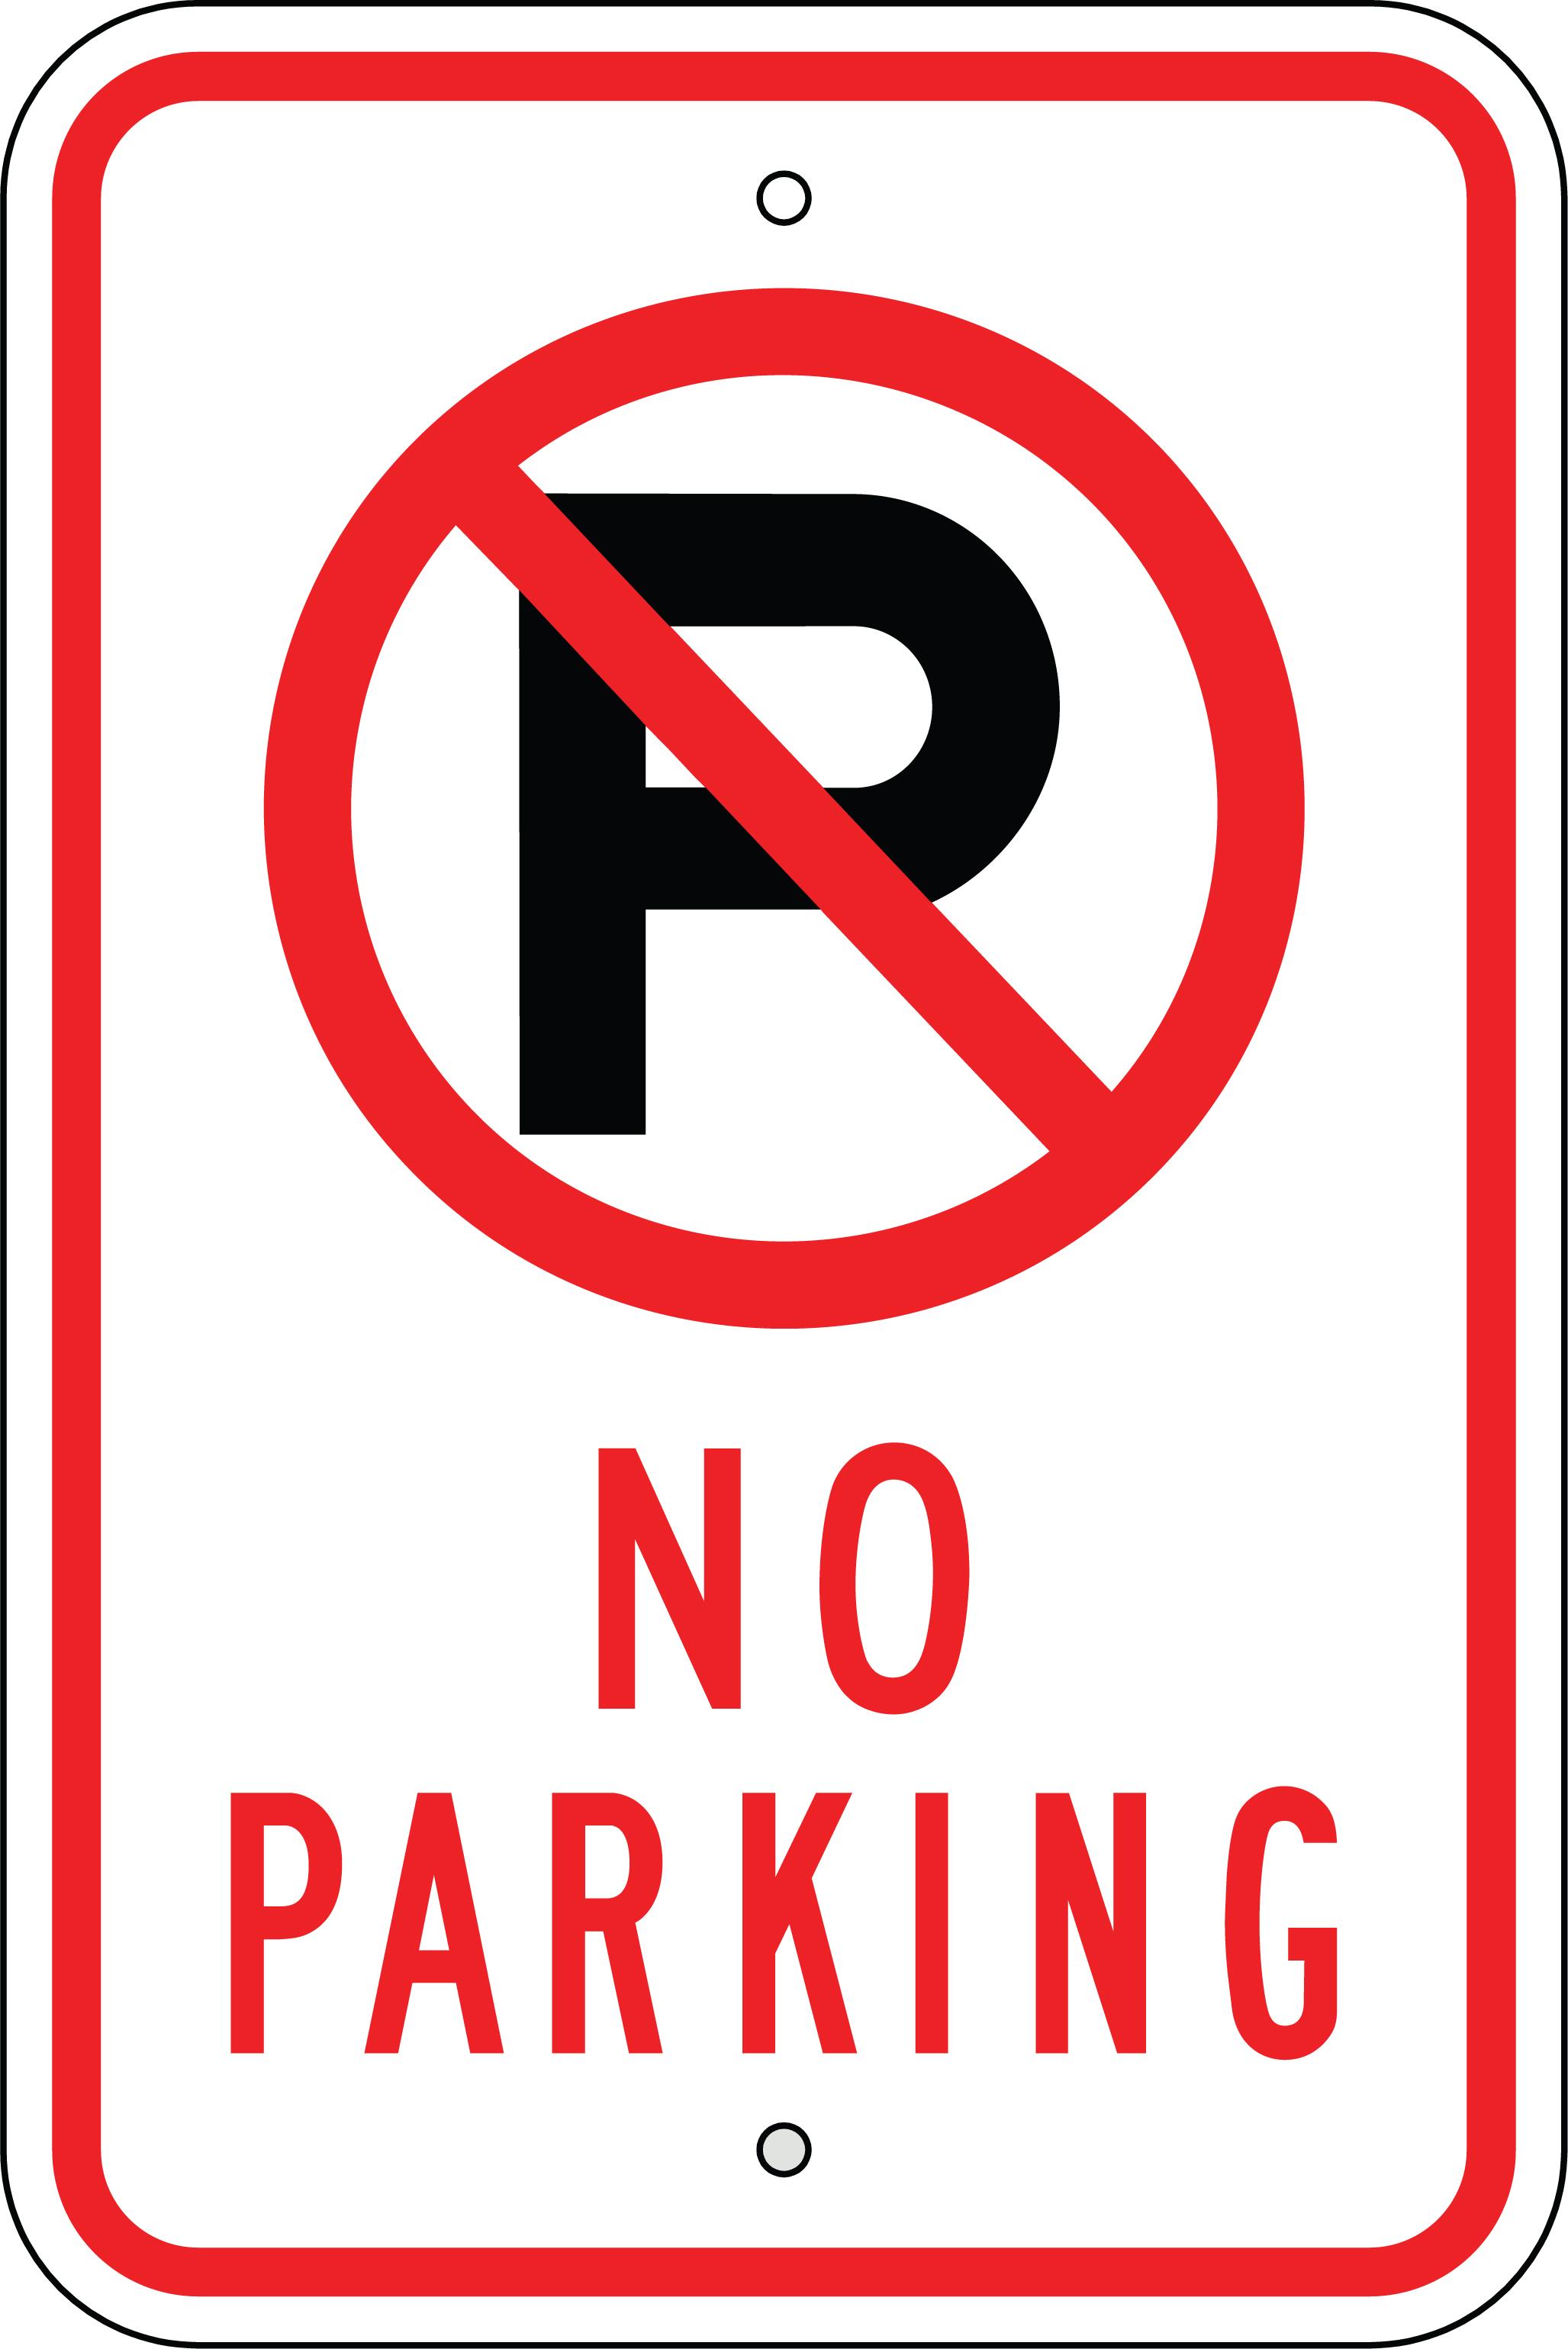 No Parking Sign Clipart.